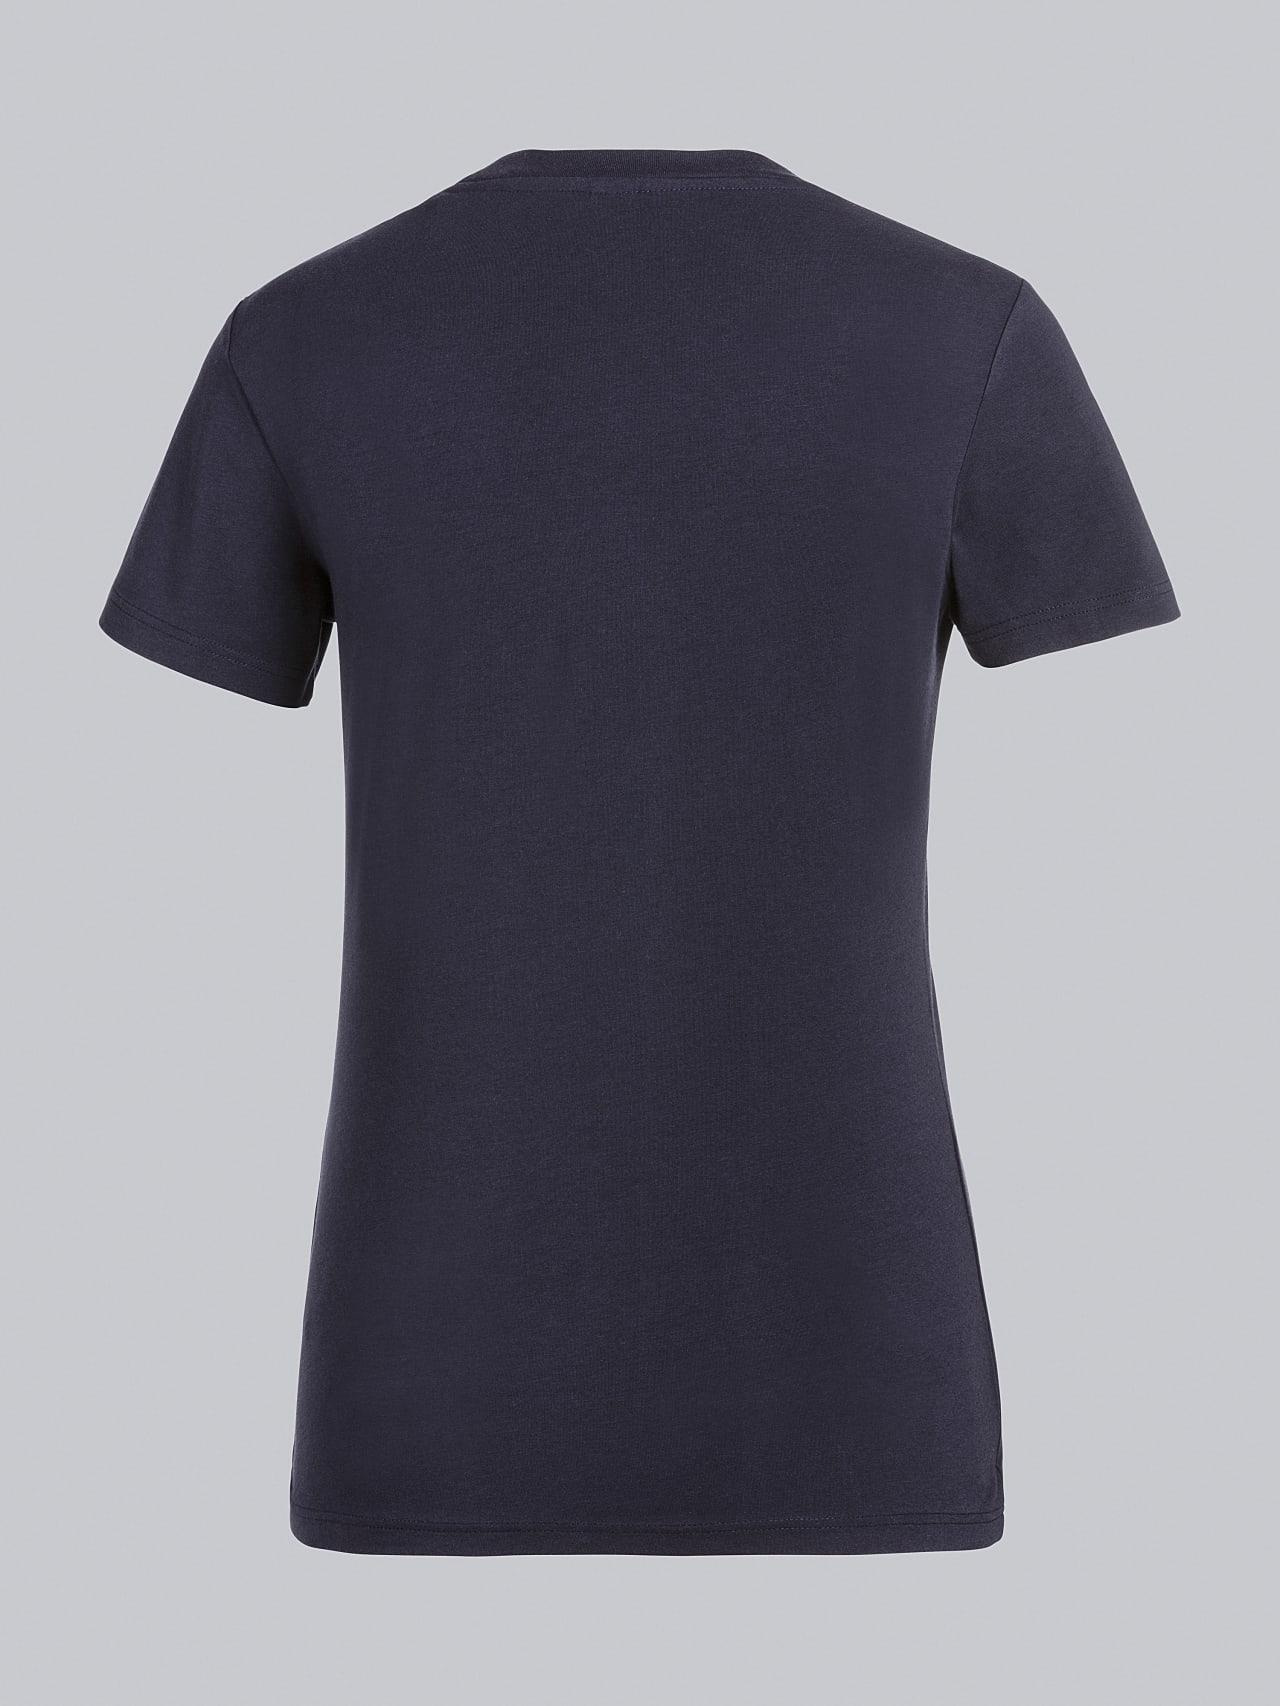 JOCTI V3.Y5.02 Logo T-Shirt navy Left Alpha Tauri